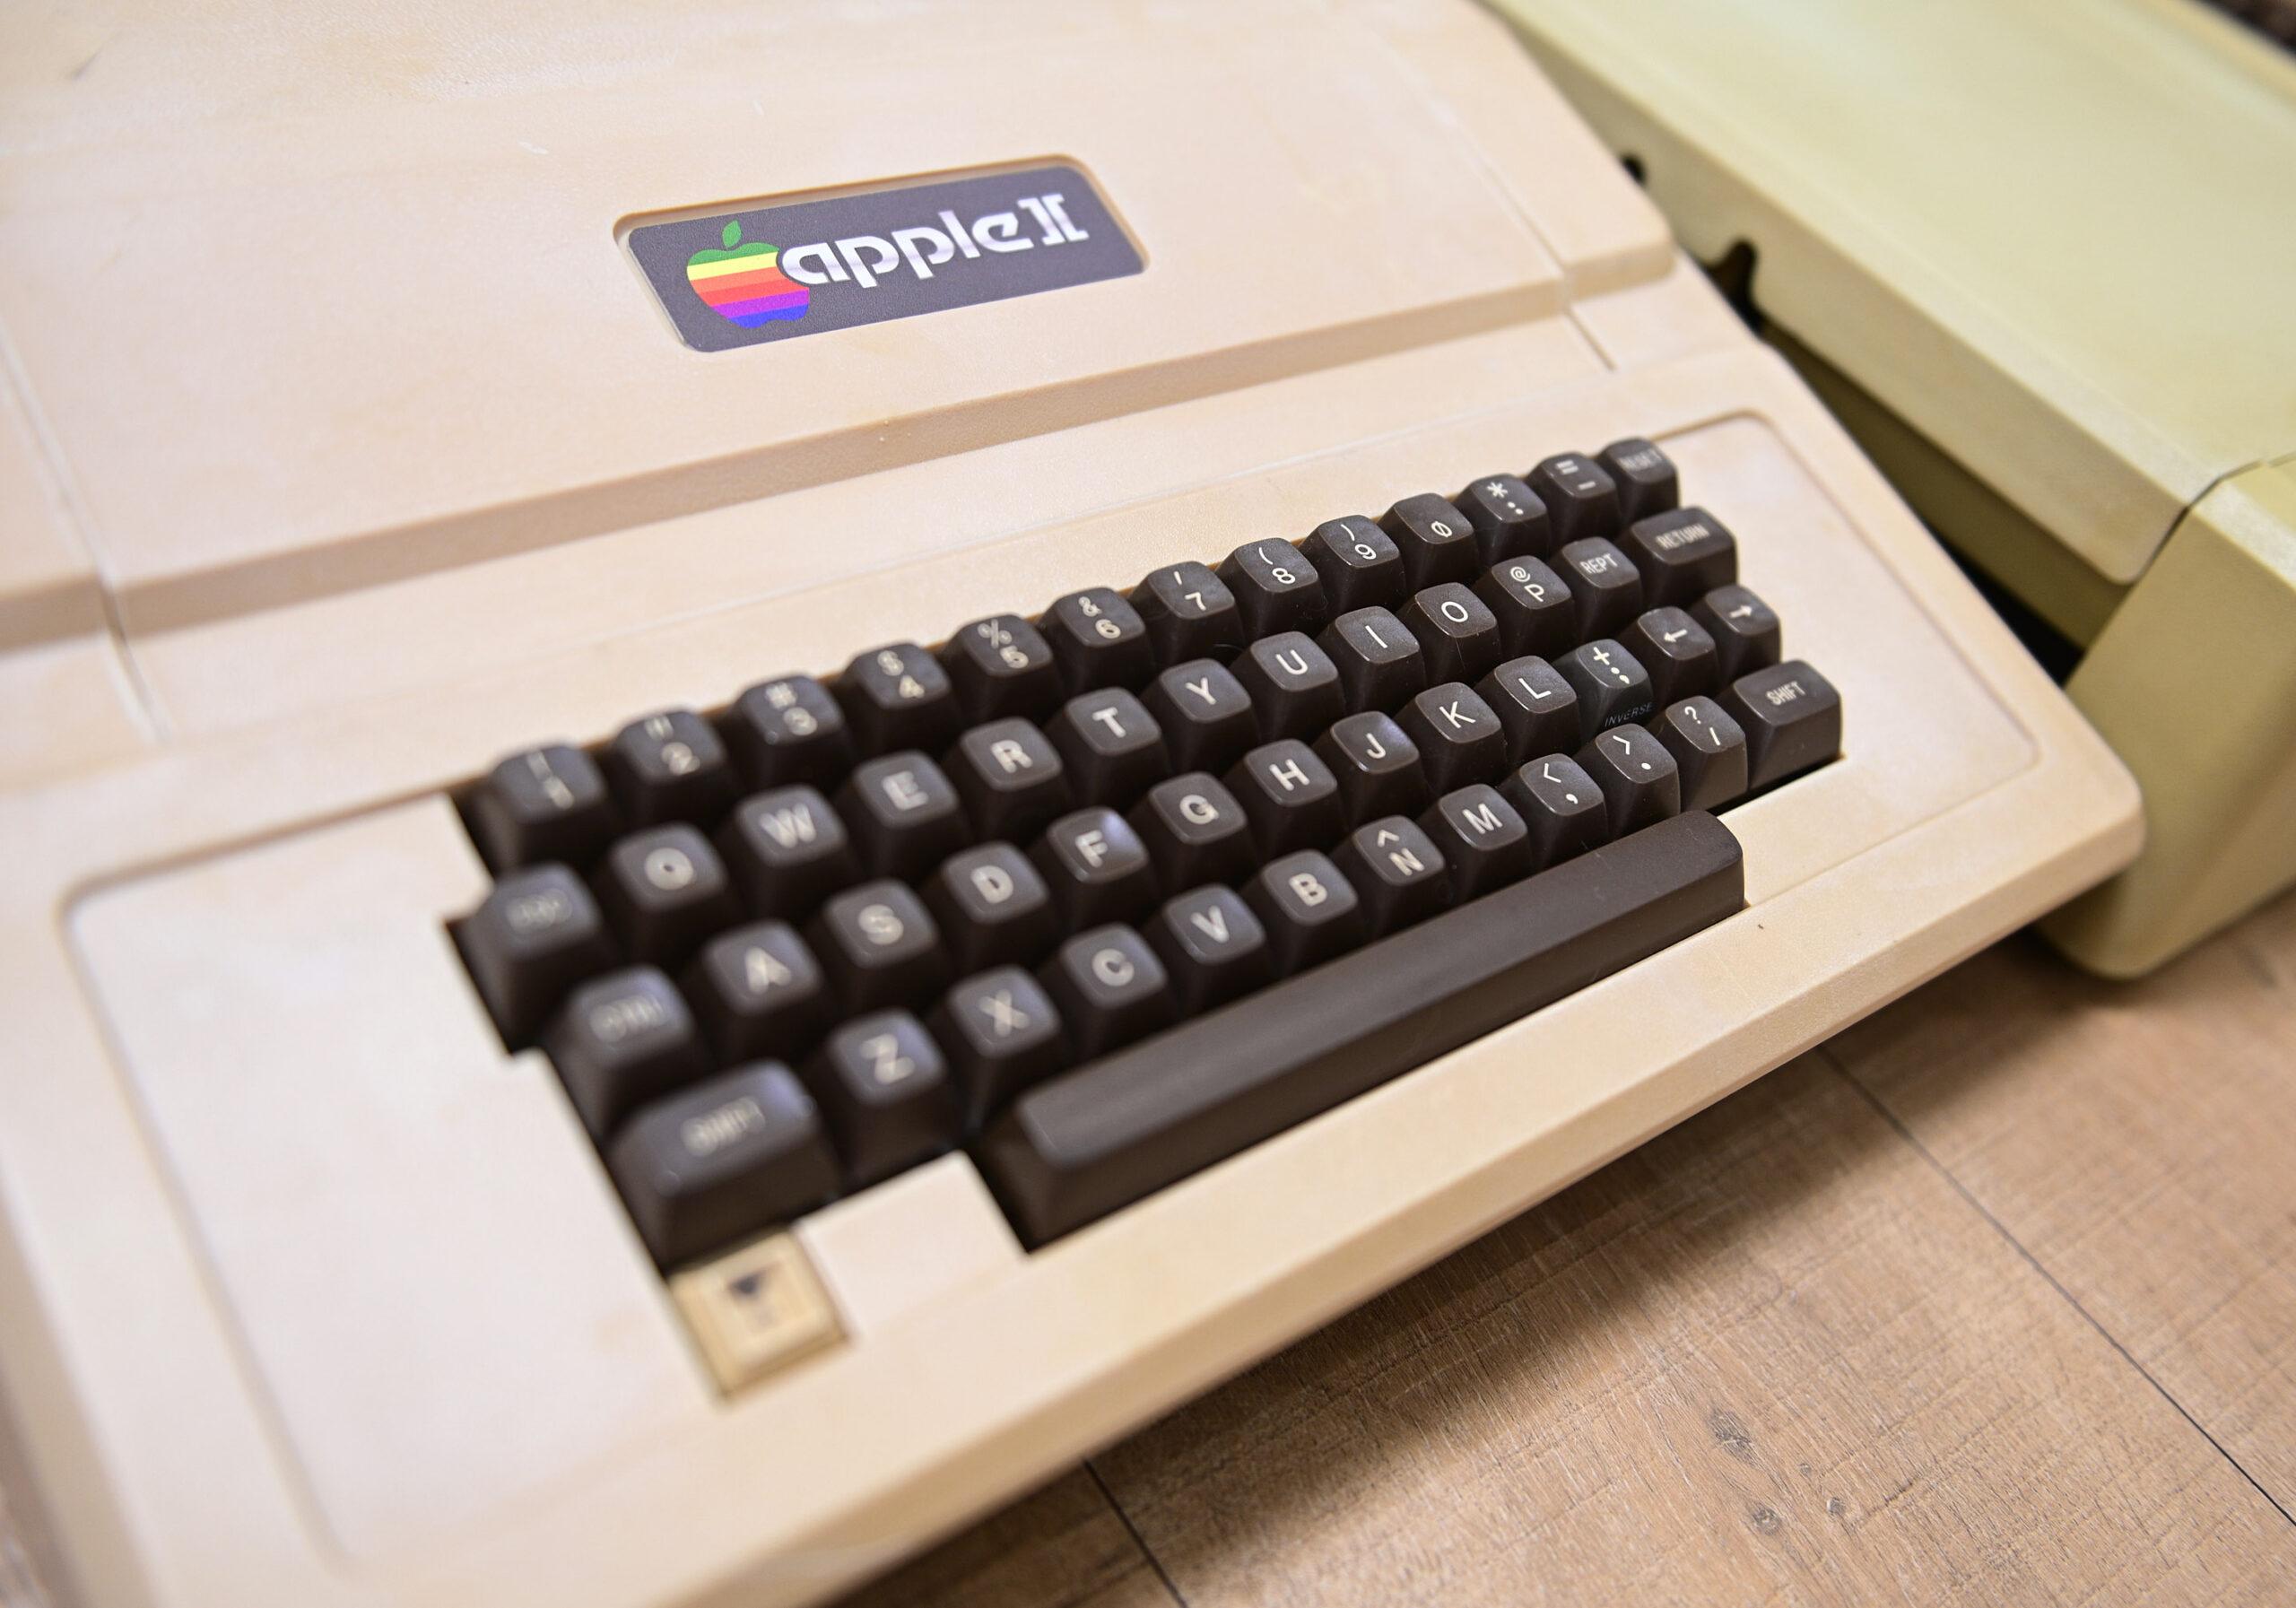 Apple II 的影子——仿制机